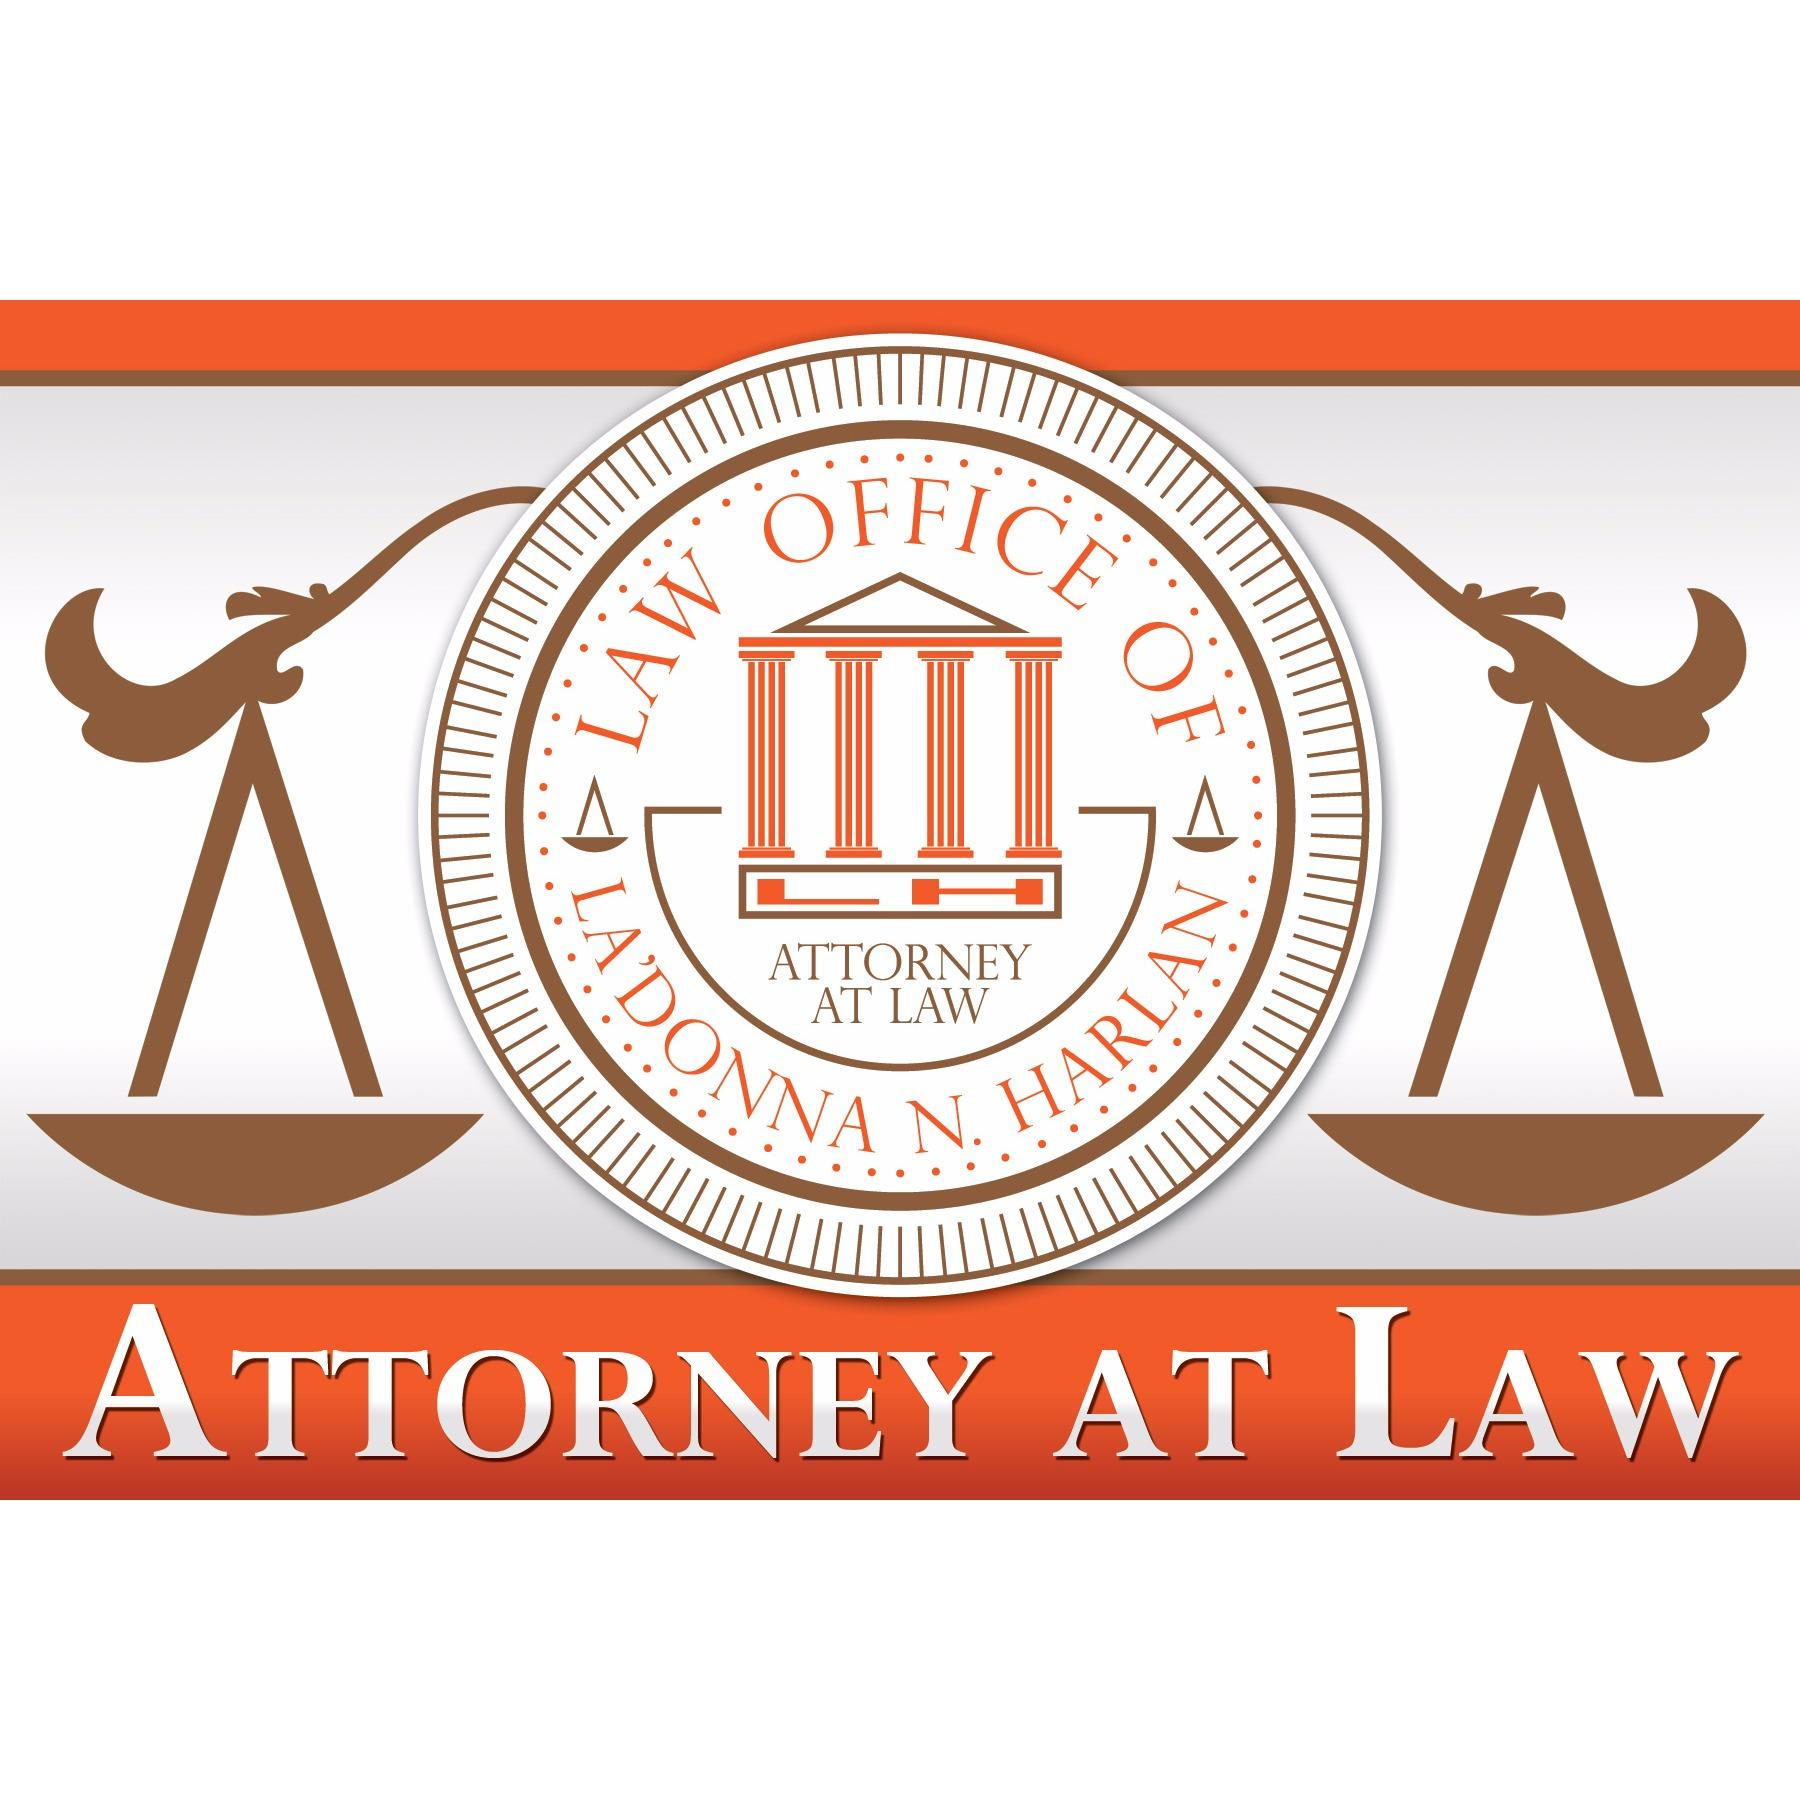 Law Office of La'Donna Harlan, PLLC image 5